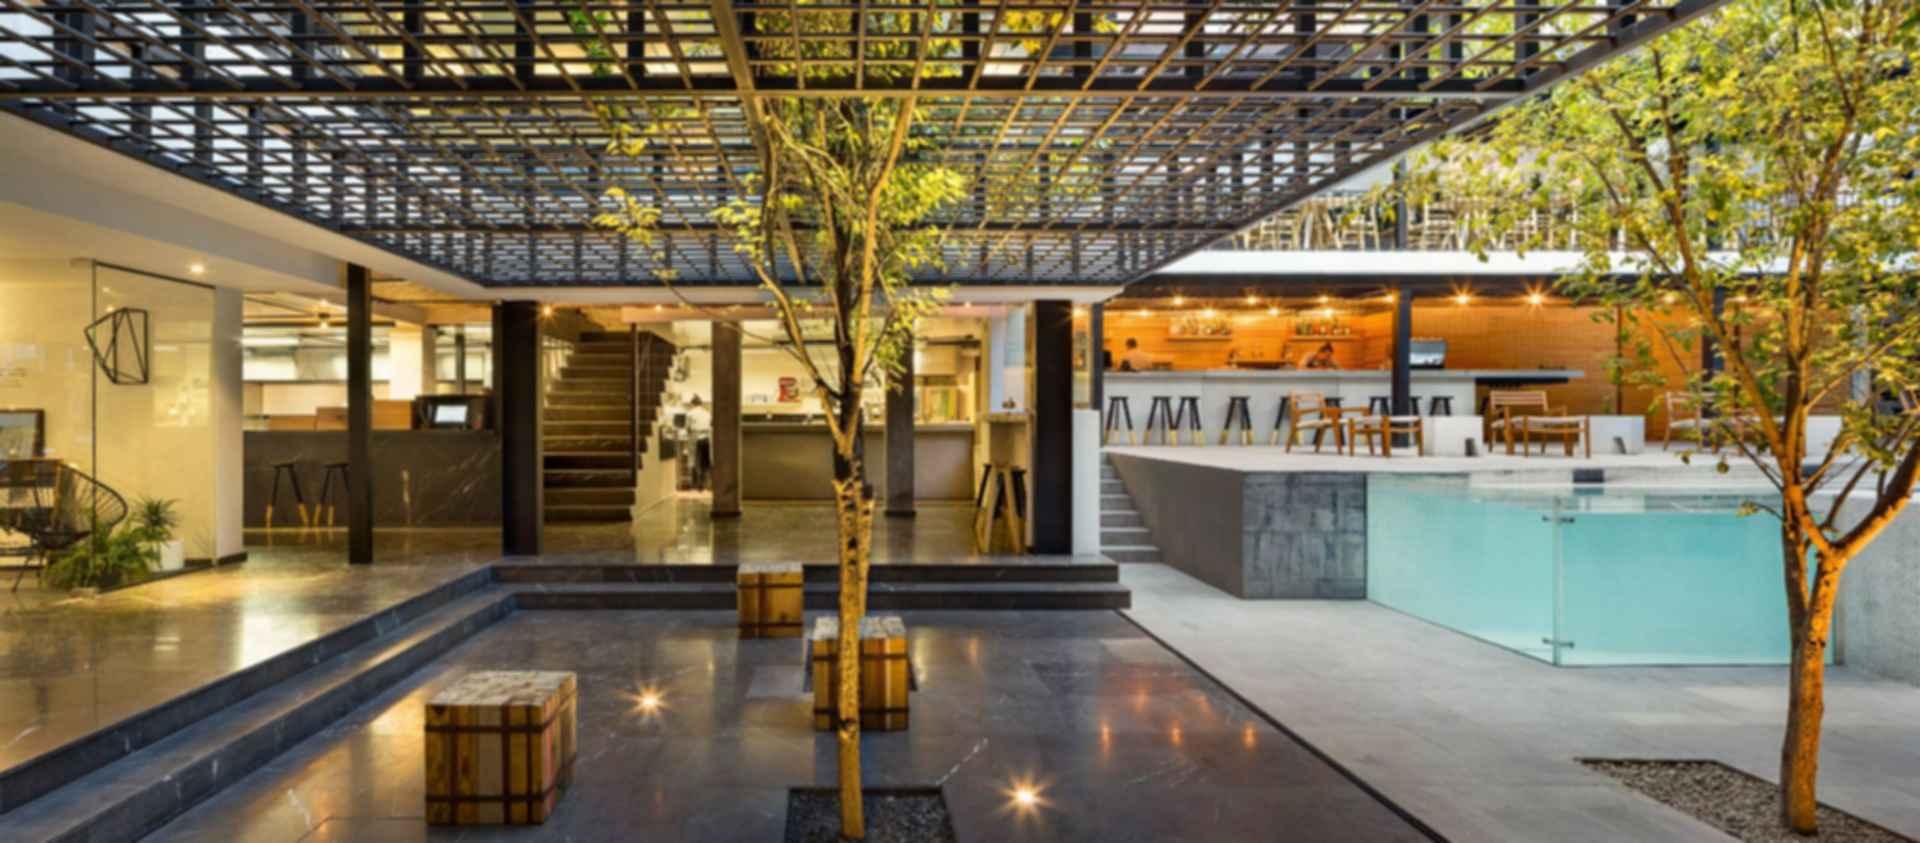 Carlota Hotel - interior/exterior